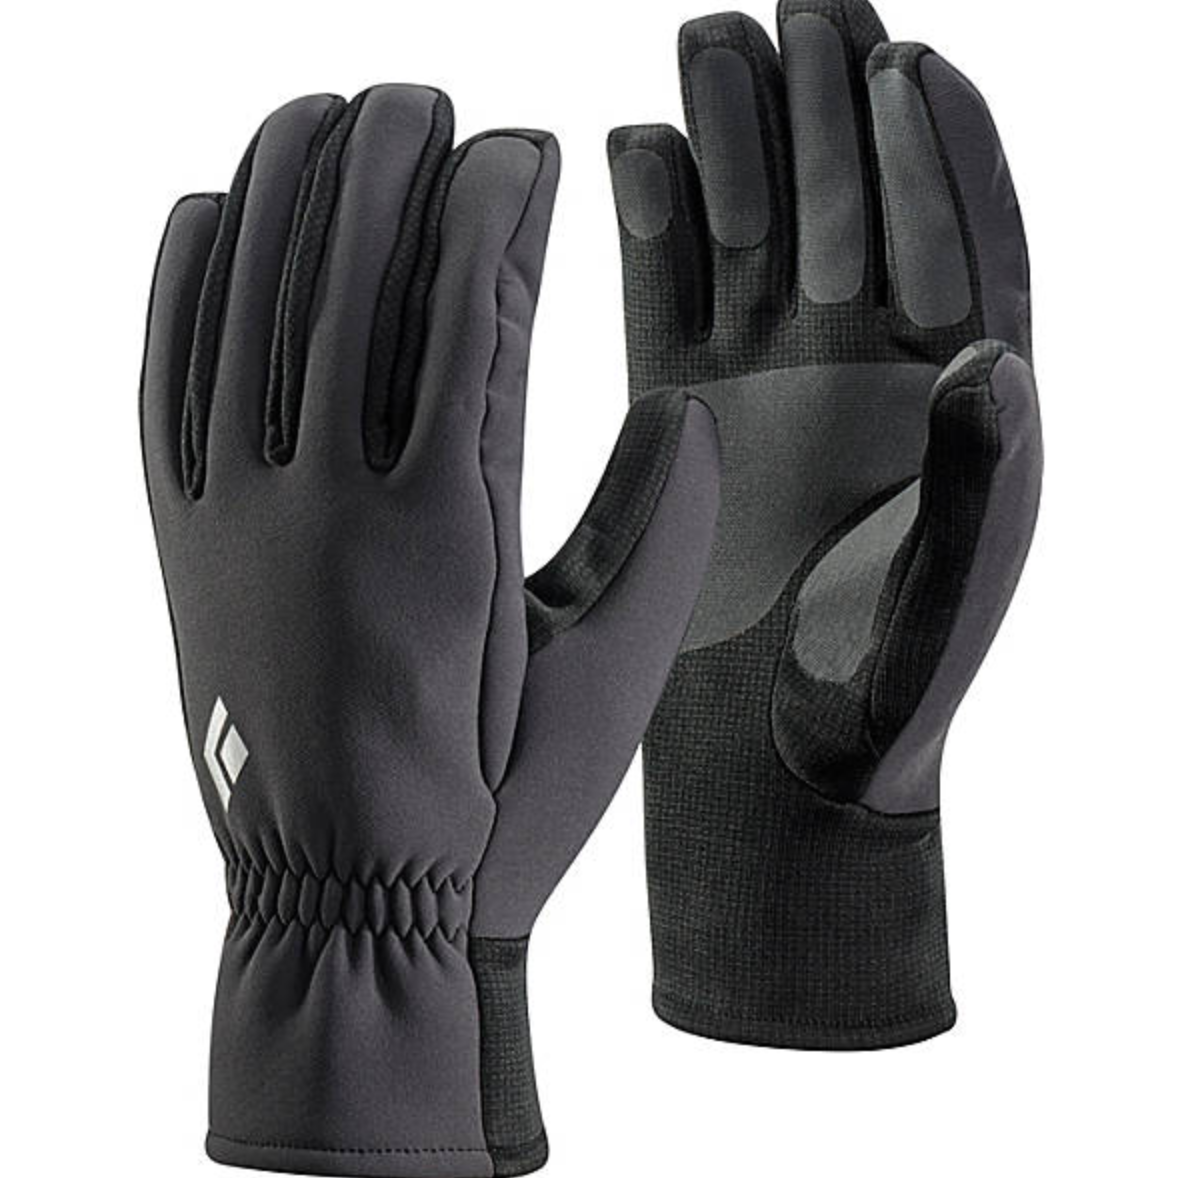 Black Diamond Three in One Gloves